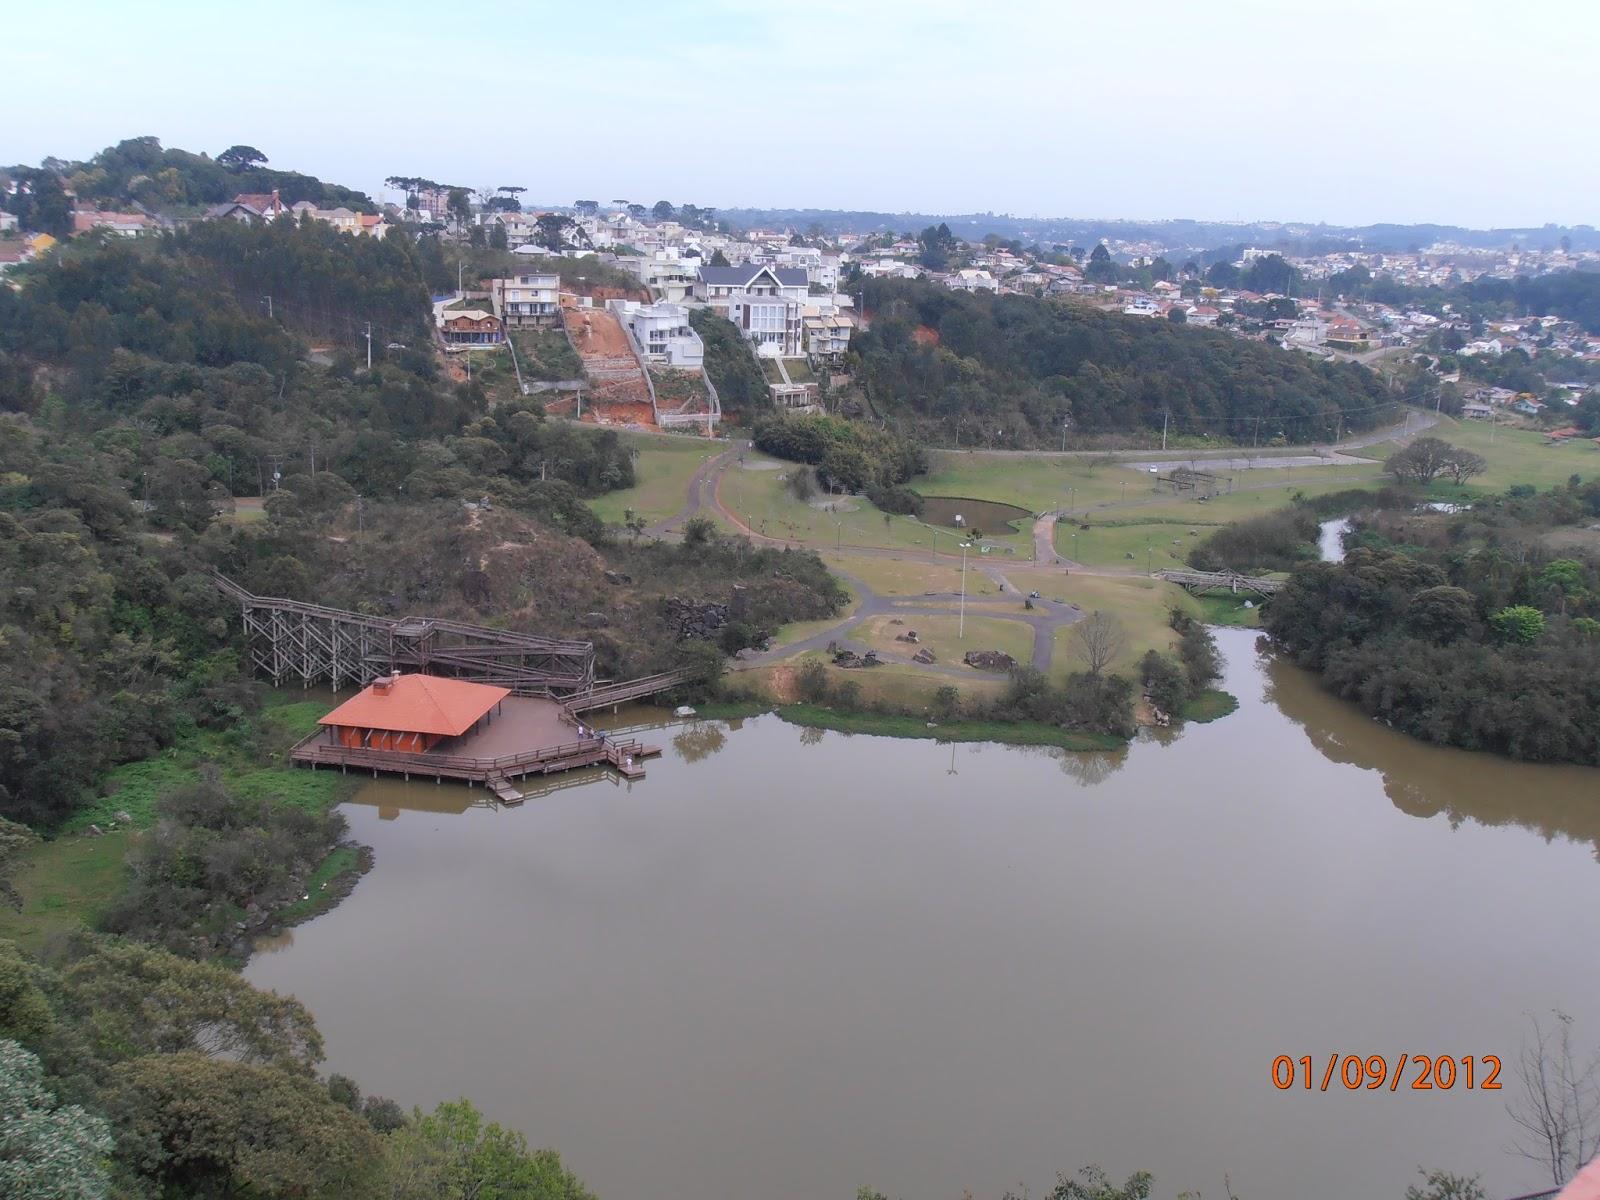 Parque Tanguá - Curitiba